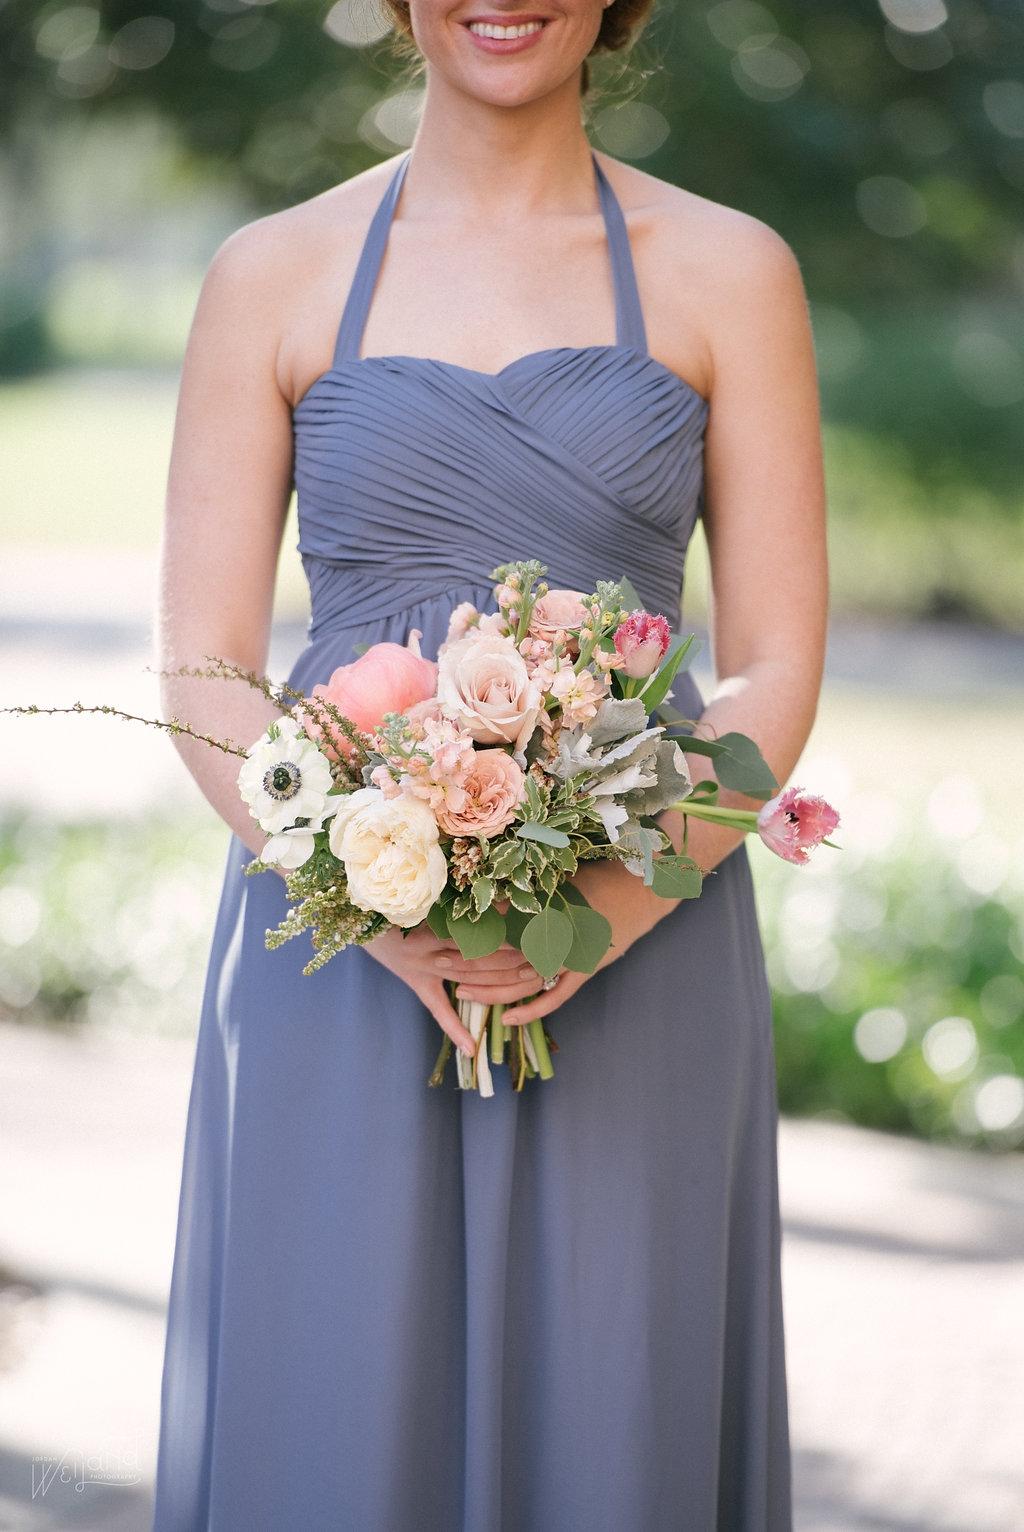 Peach Bridesmaid Bouquet || Lisa Stoner Events || Velvet & Twine || Jordan Weiland Photography